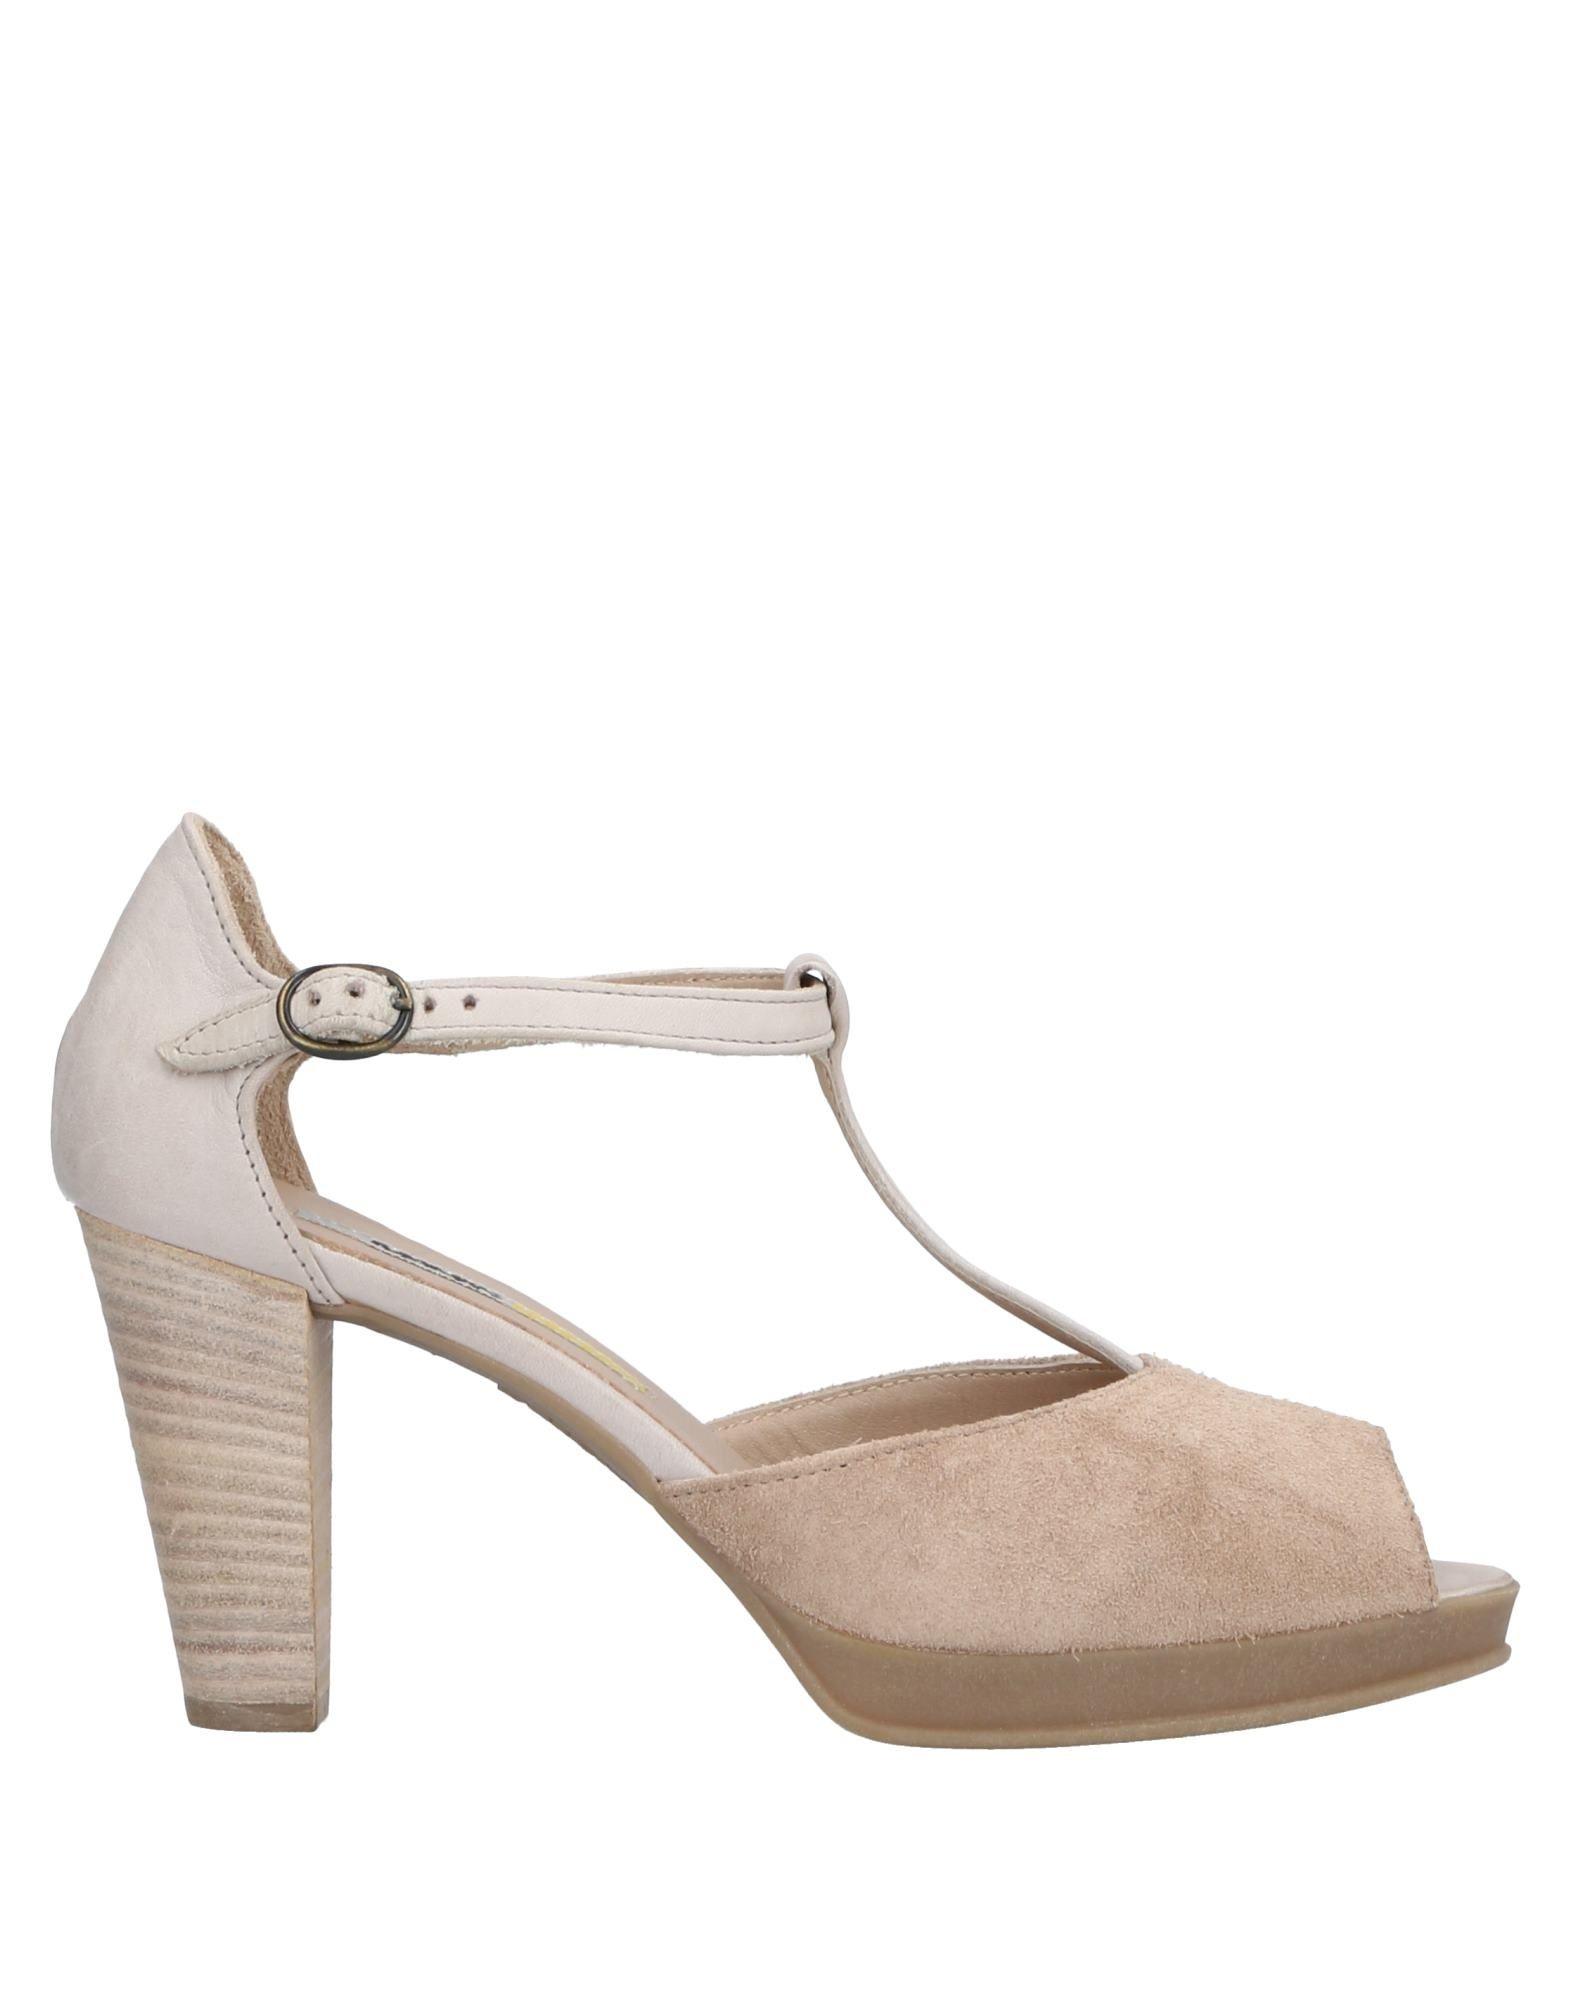 Manas Sandalen Damen  11543703SE Gute Qualität beliebte Schuhe